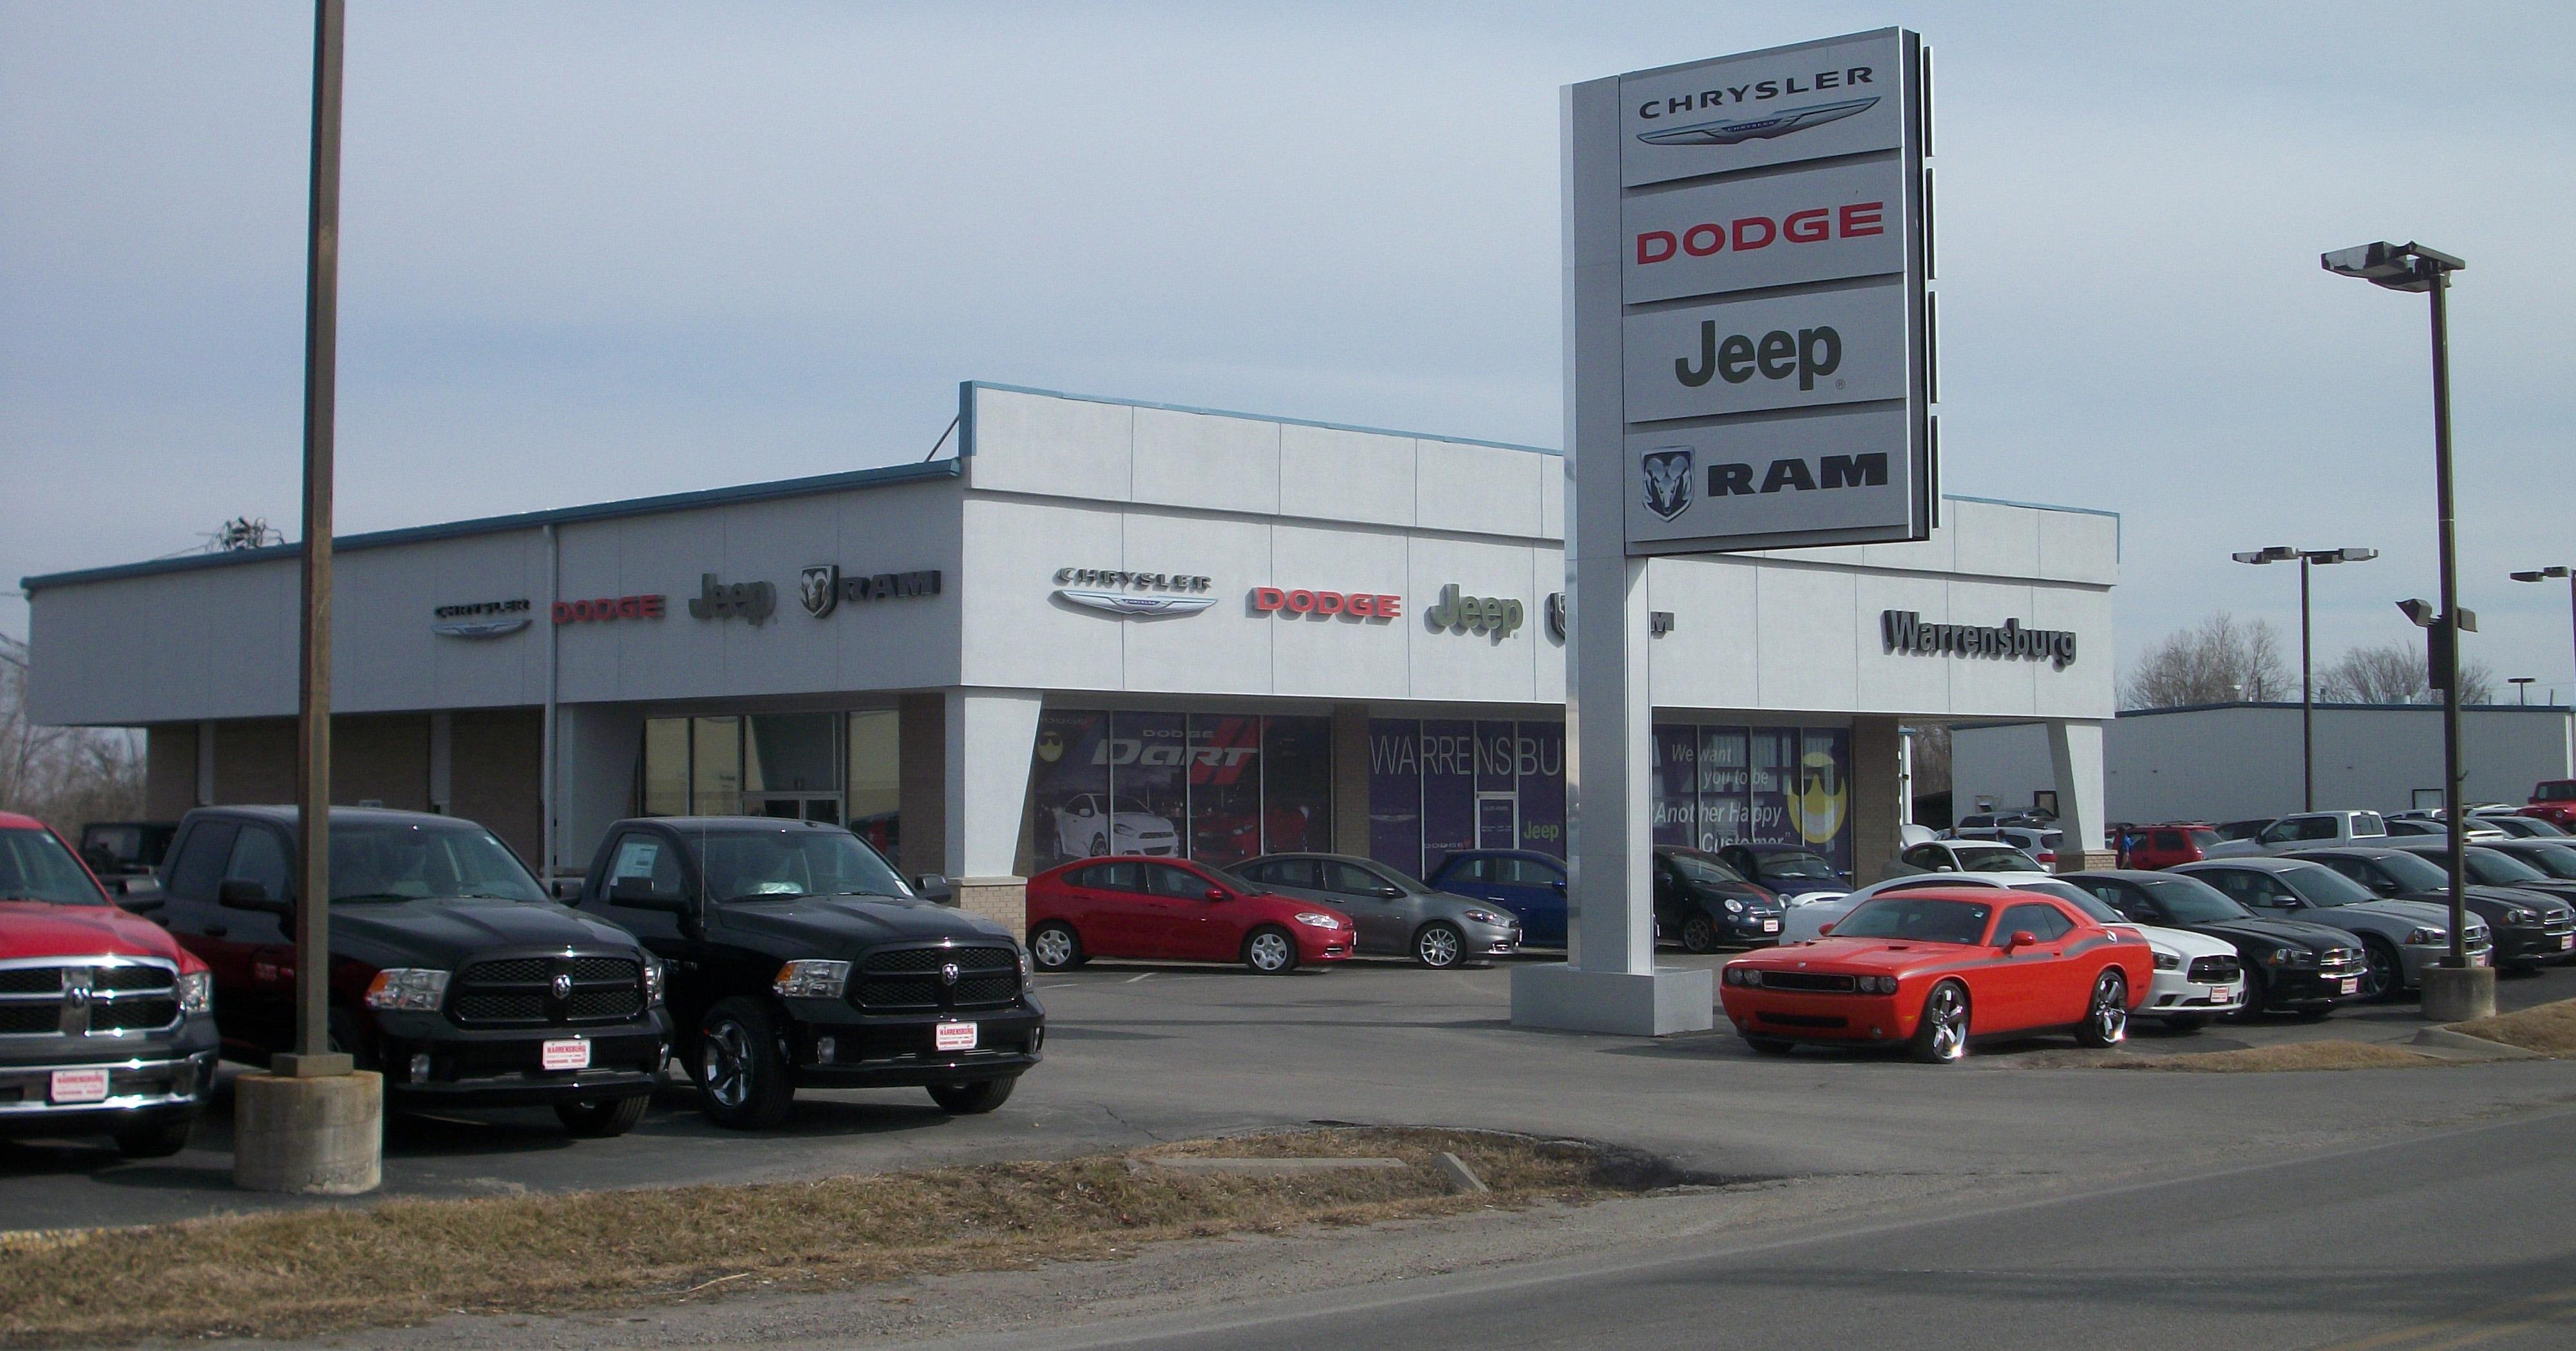 About Warrensburg Chrysler Dodge Jeep RAM